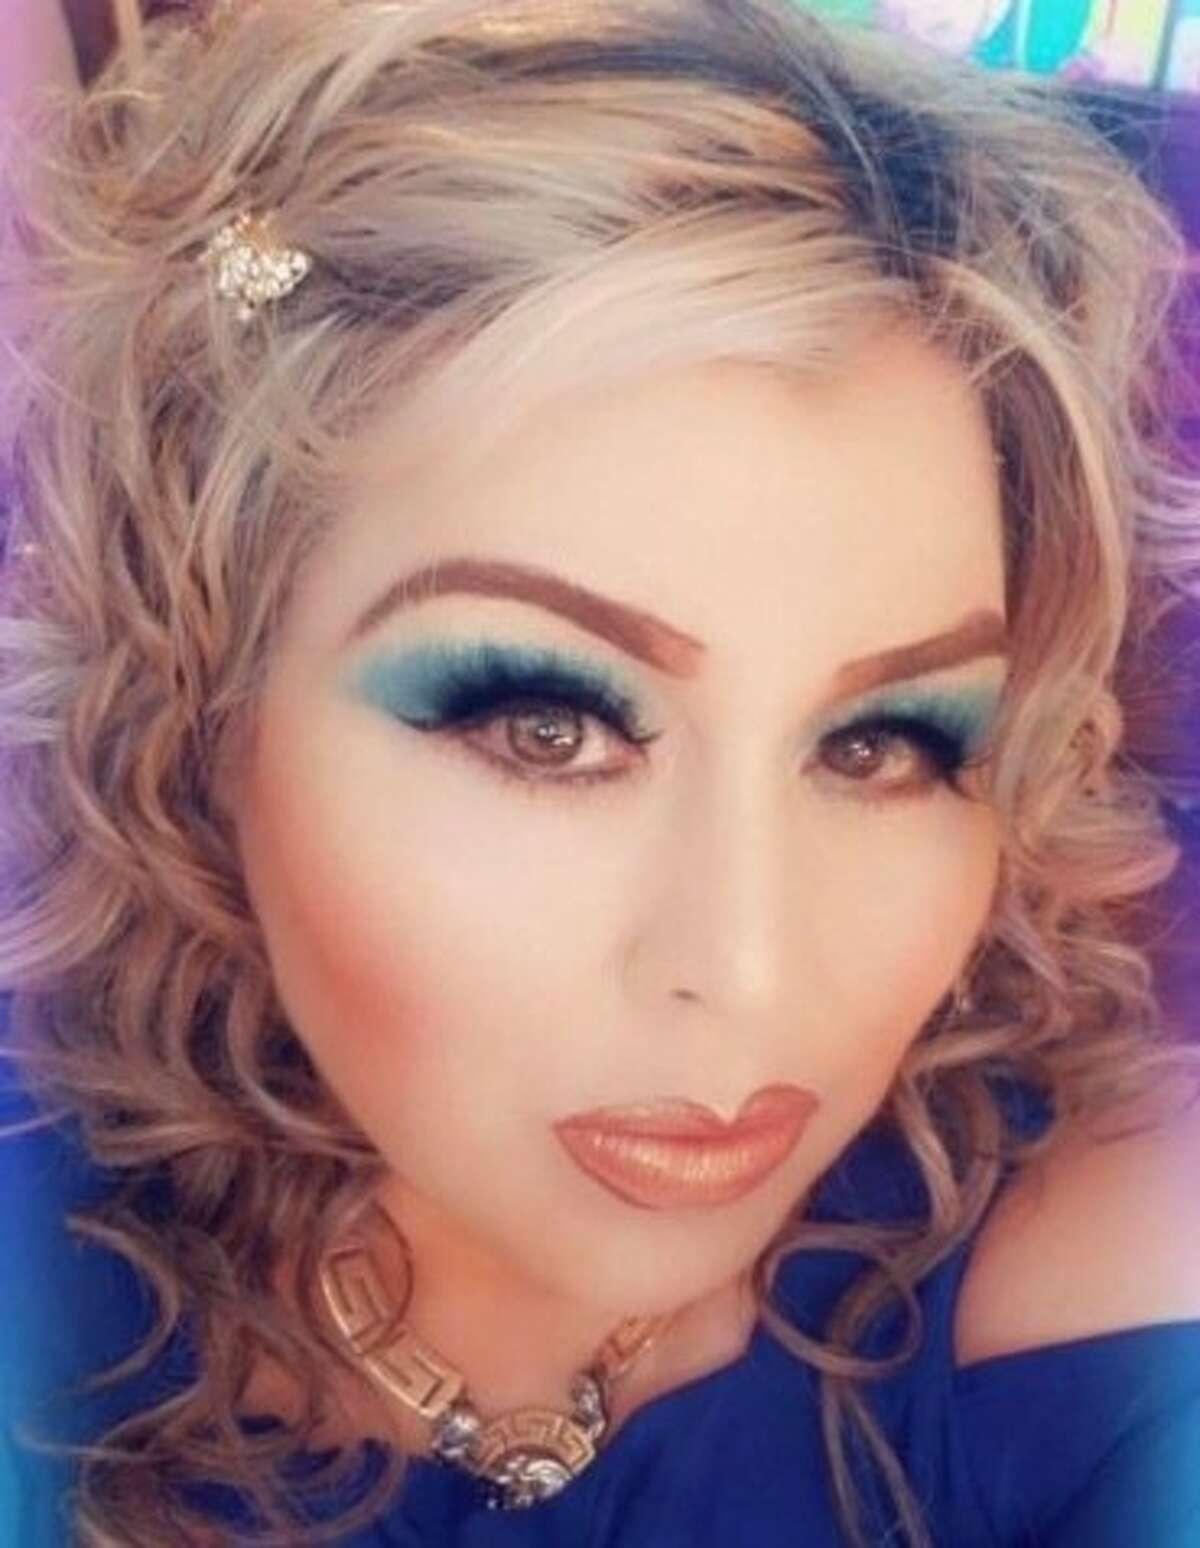 Juanita 'Mimi' Espinoza